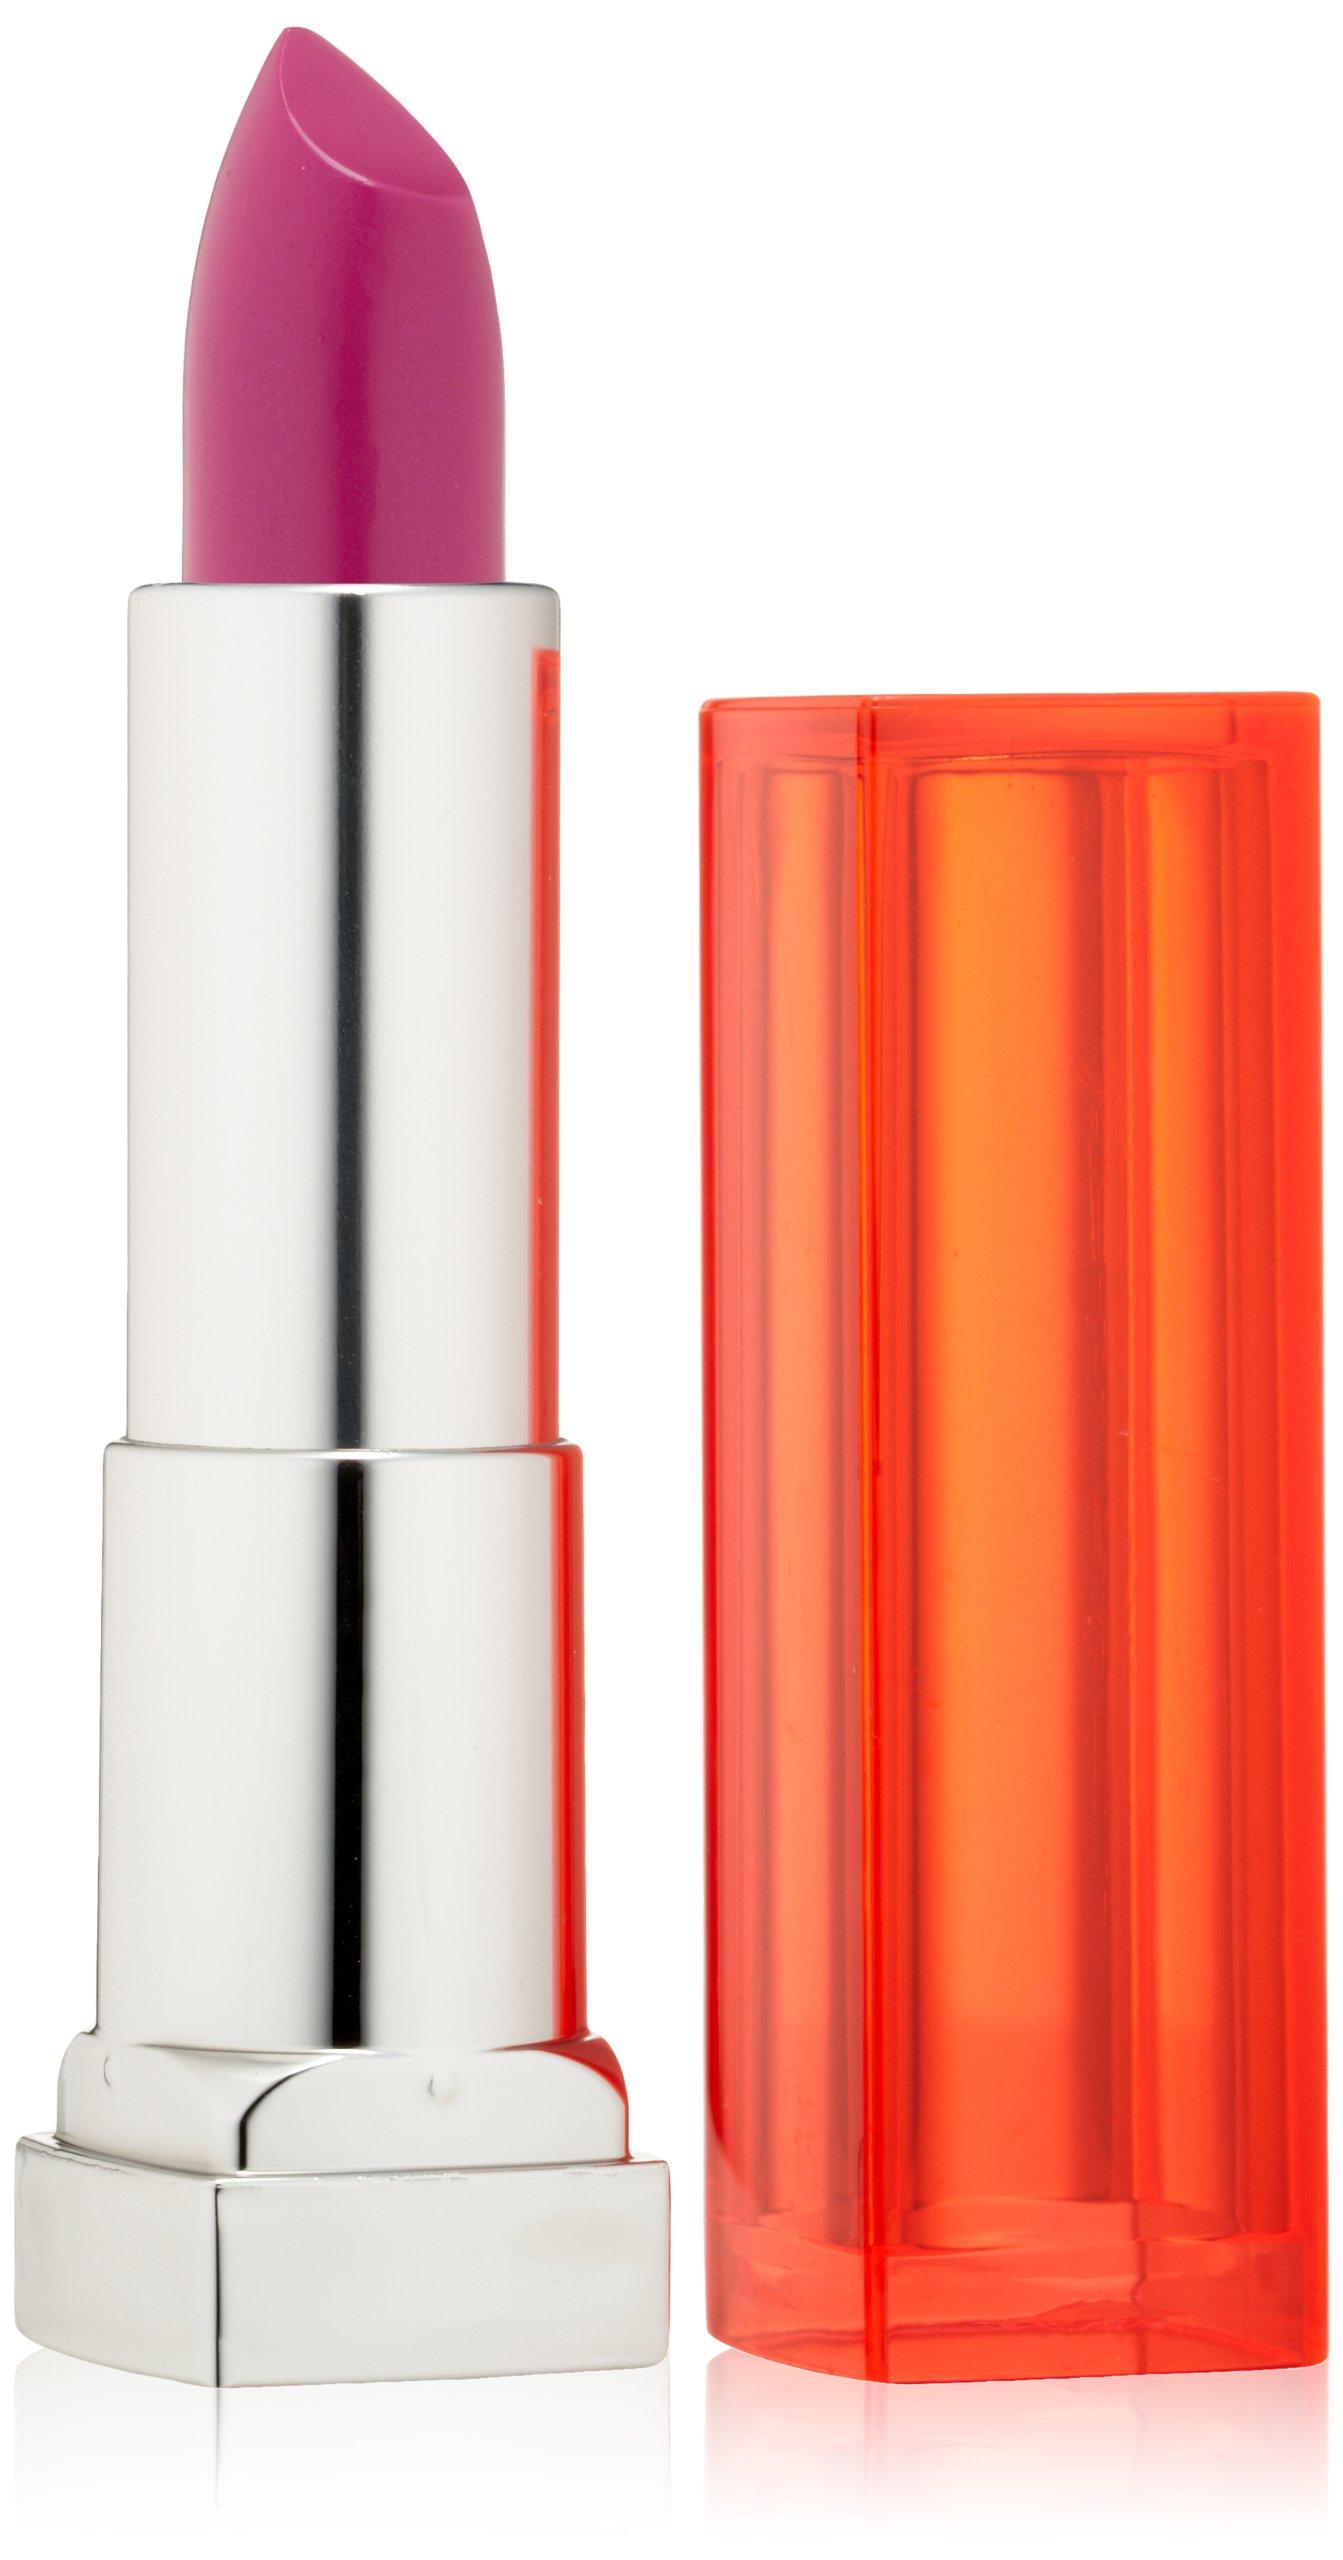 Maybelline New York - Maybelline New York Color Sensational Vivids Lipcolor, Hot Plum, 0.15 Ounce